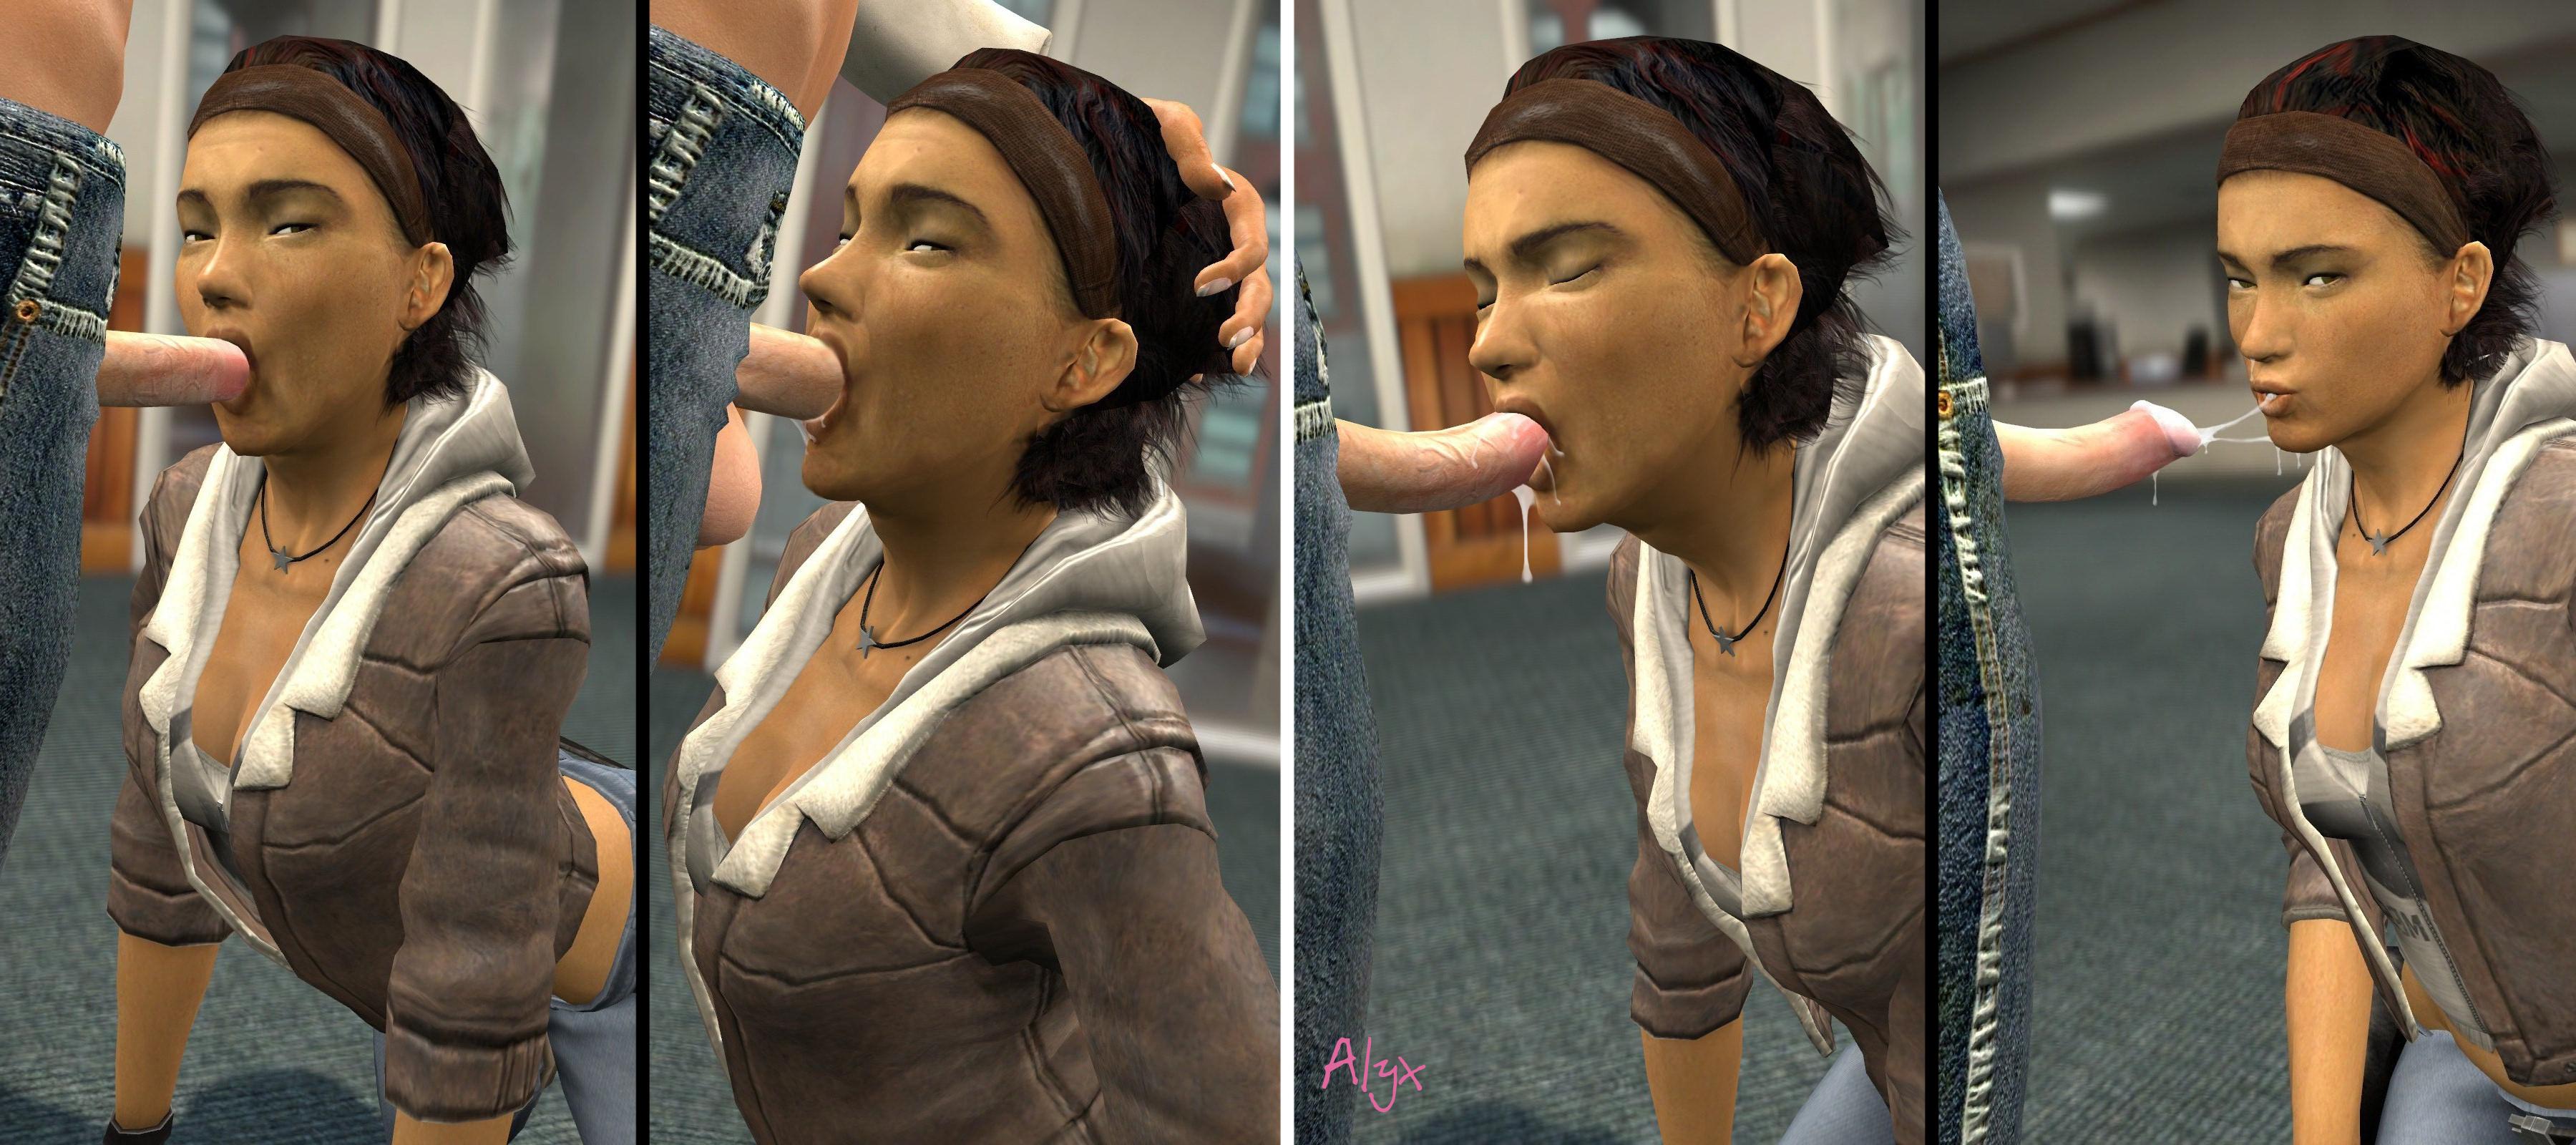 Alyx vance half life blowjob hentai tube